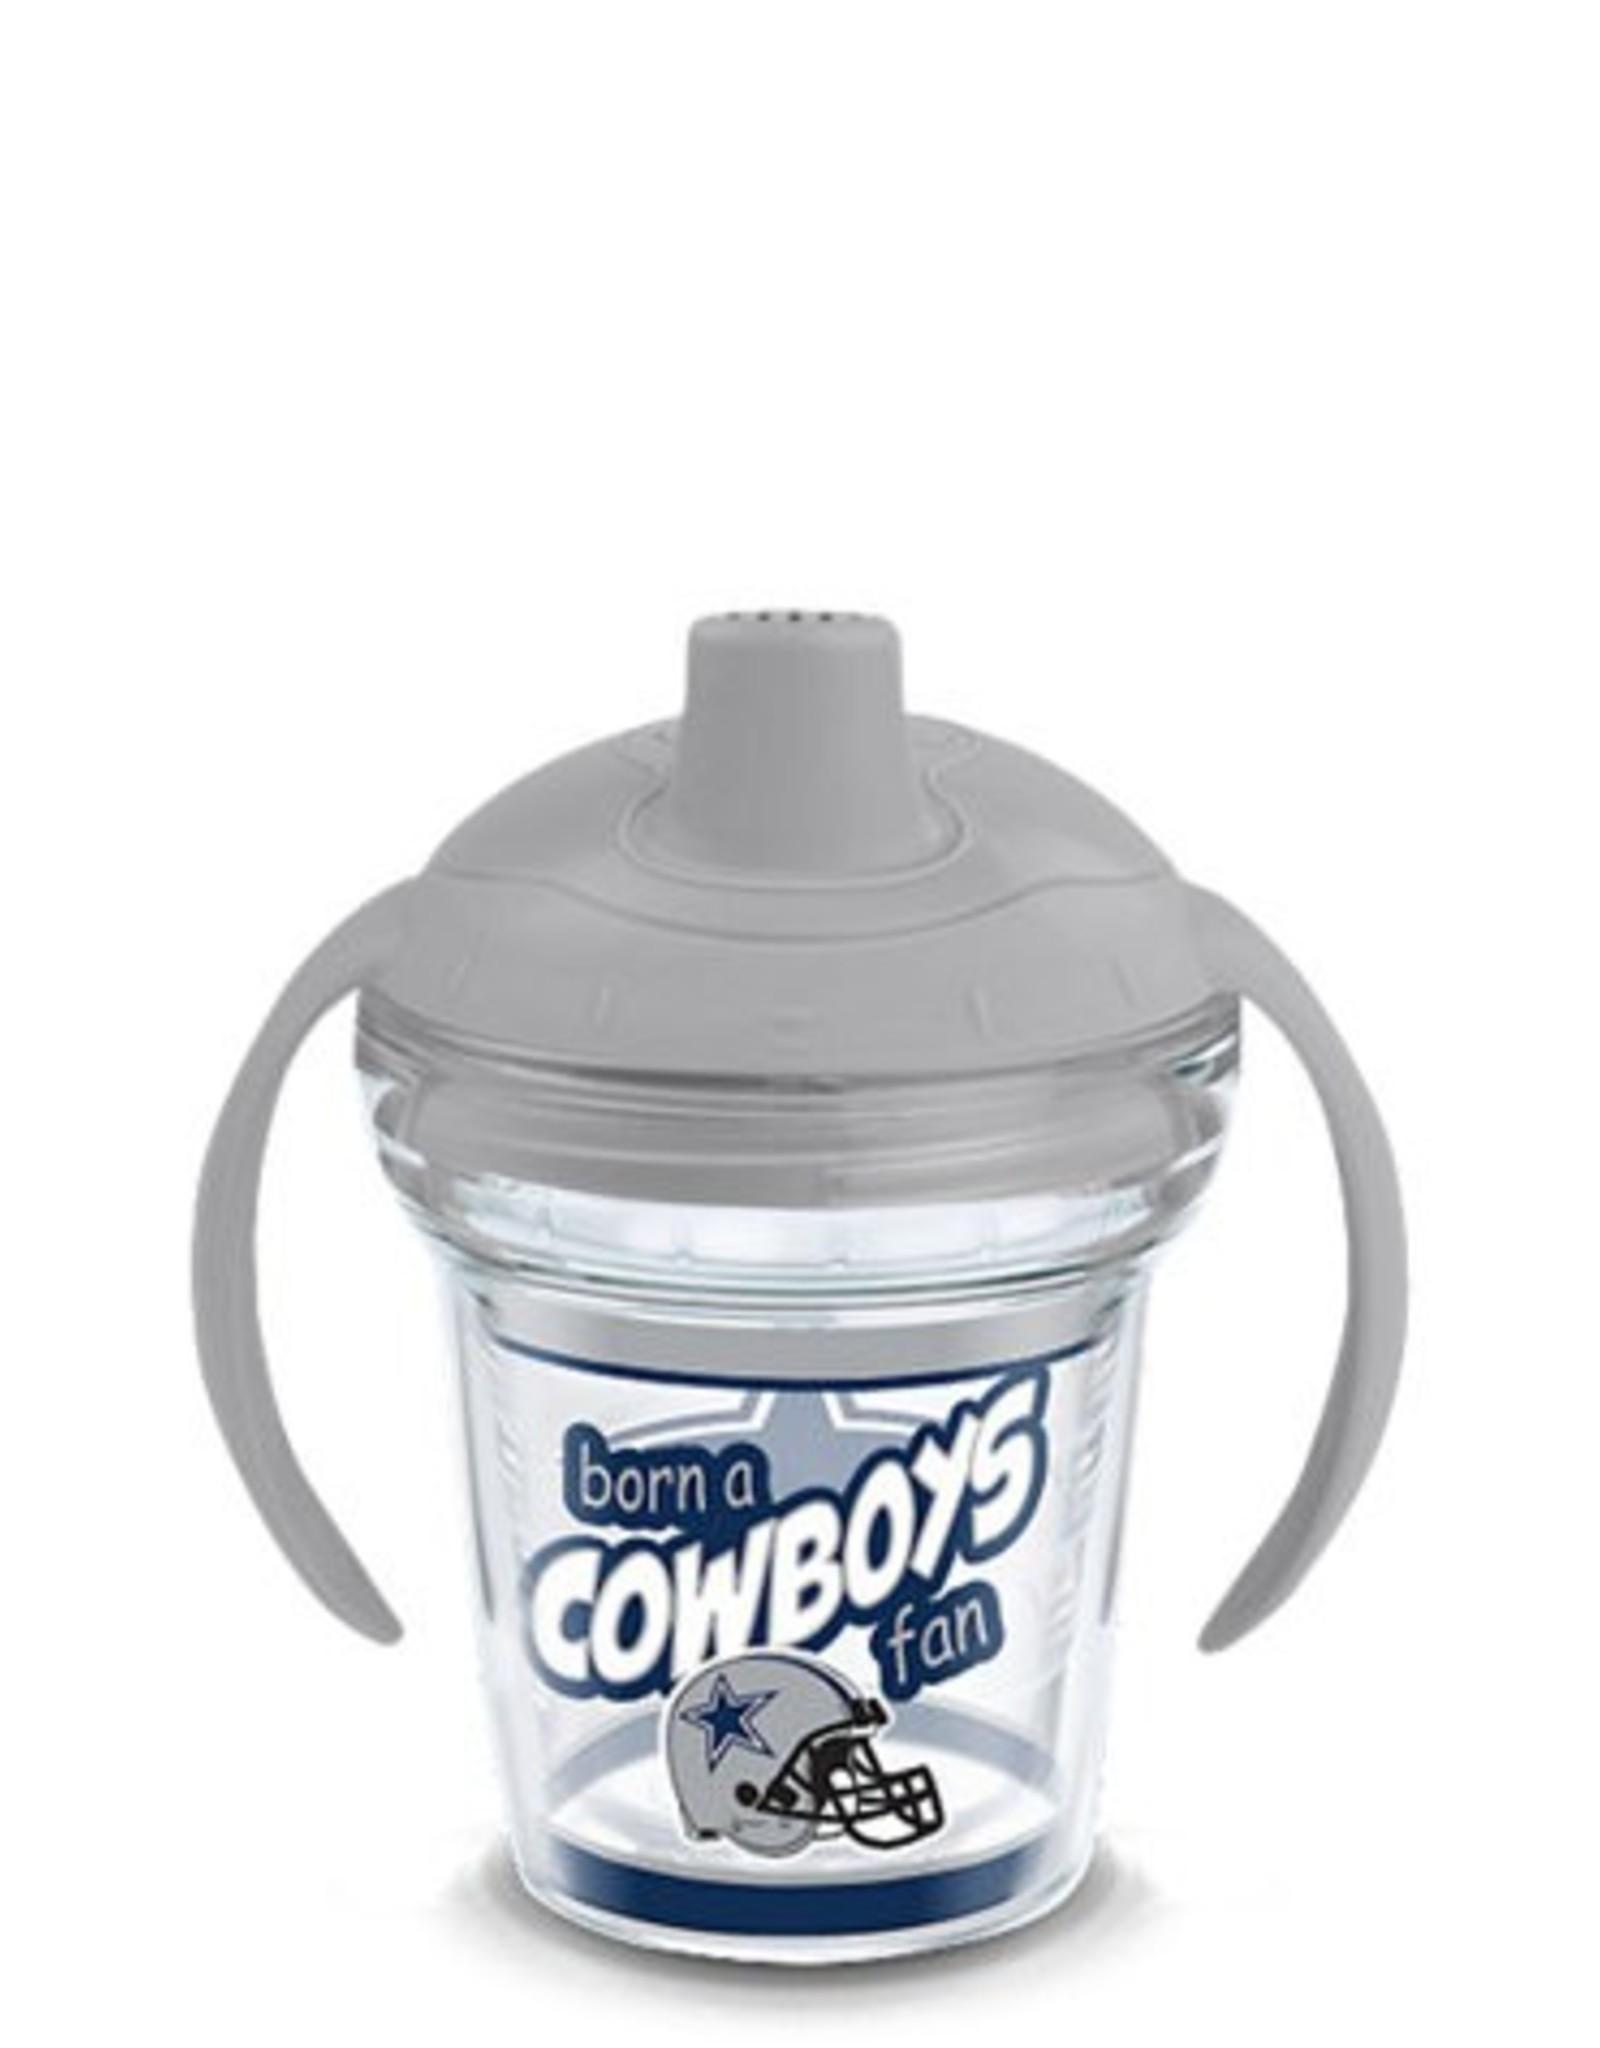 TERVIS Dallas Cowboys Tervis BORN A FAN Sippy Cup